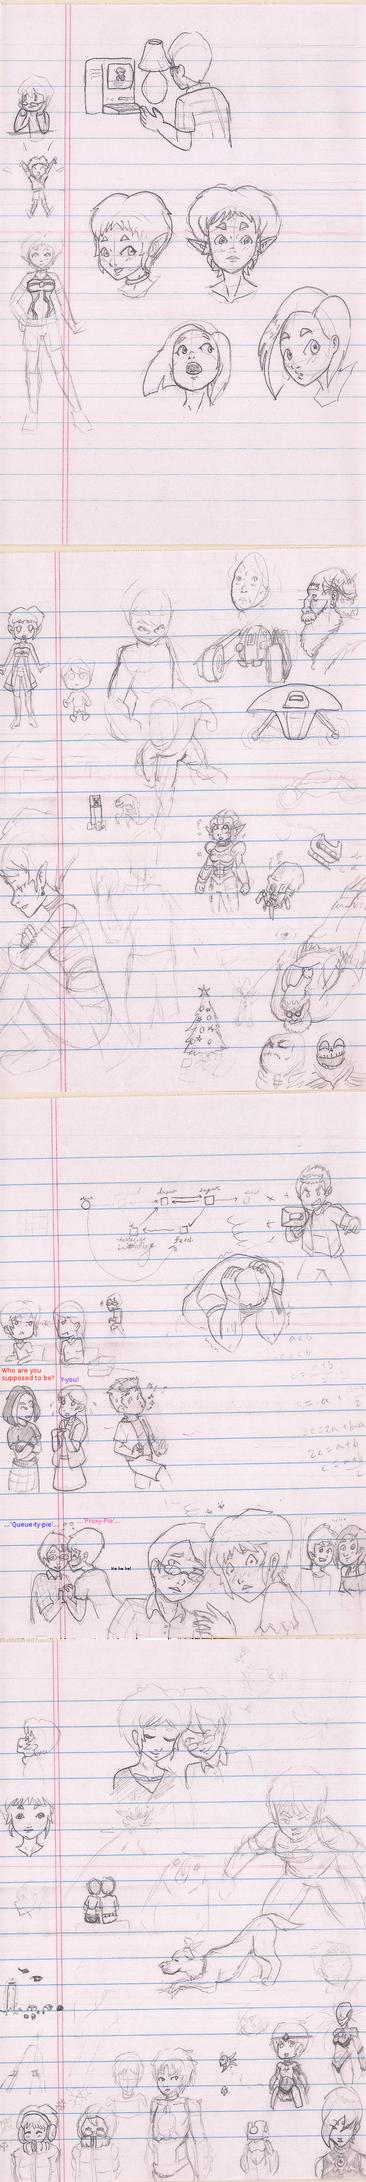 Doodle Dump (December 2014, III) by Zcmrrd